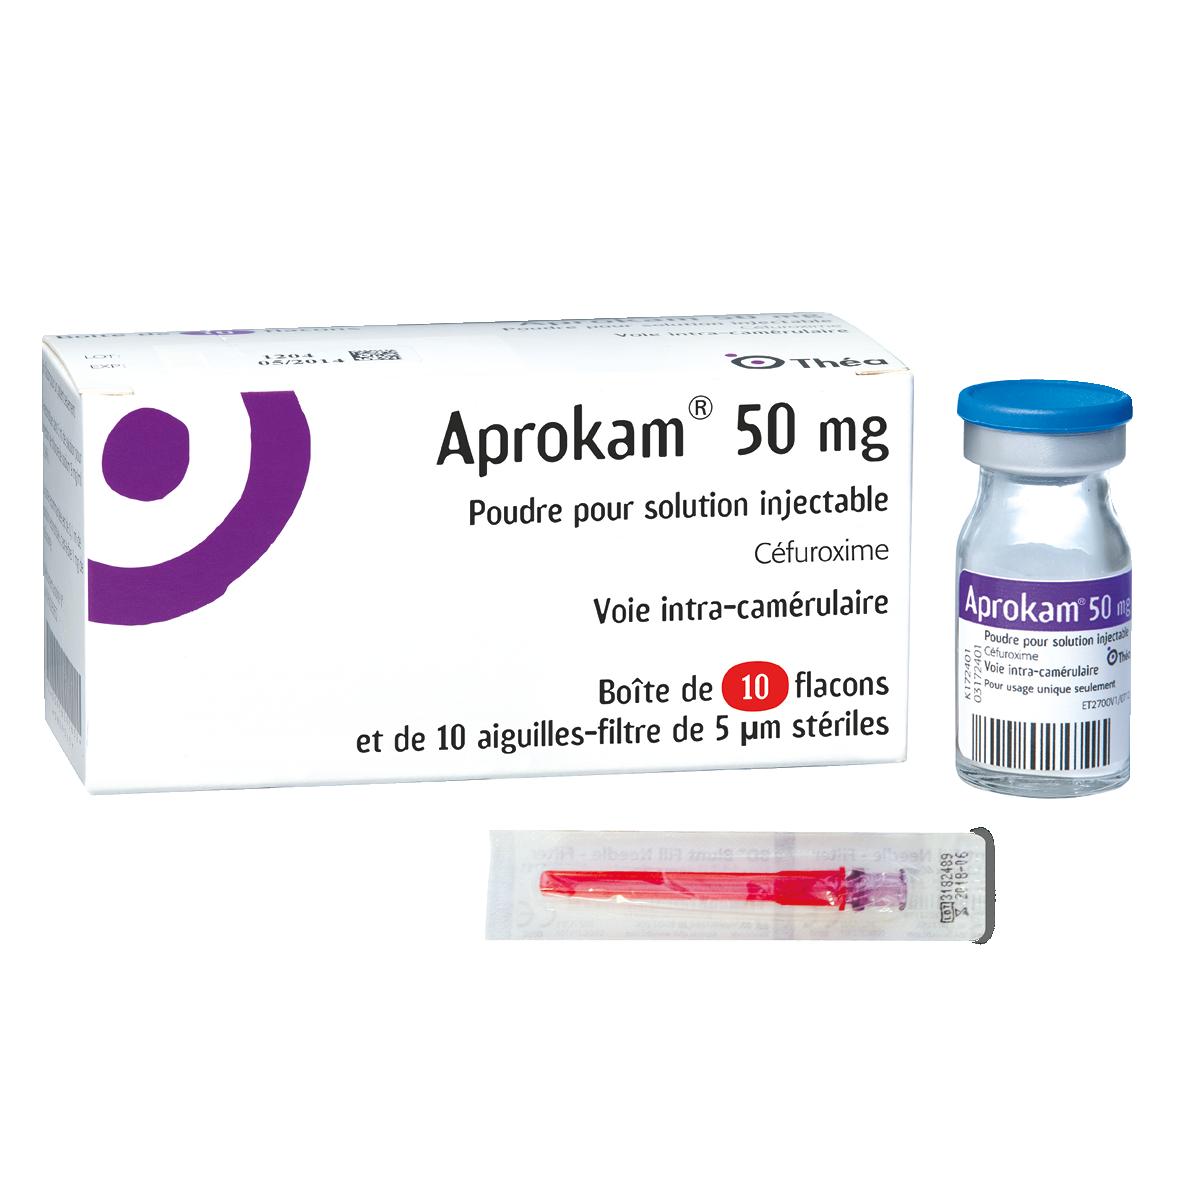 APROKAM® Image